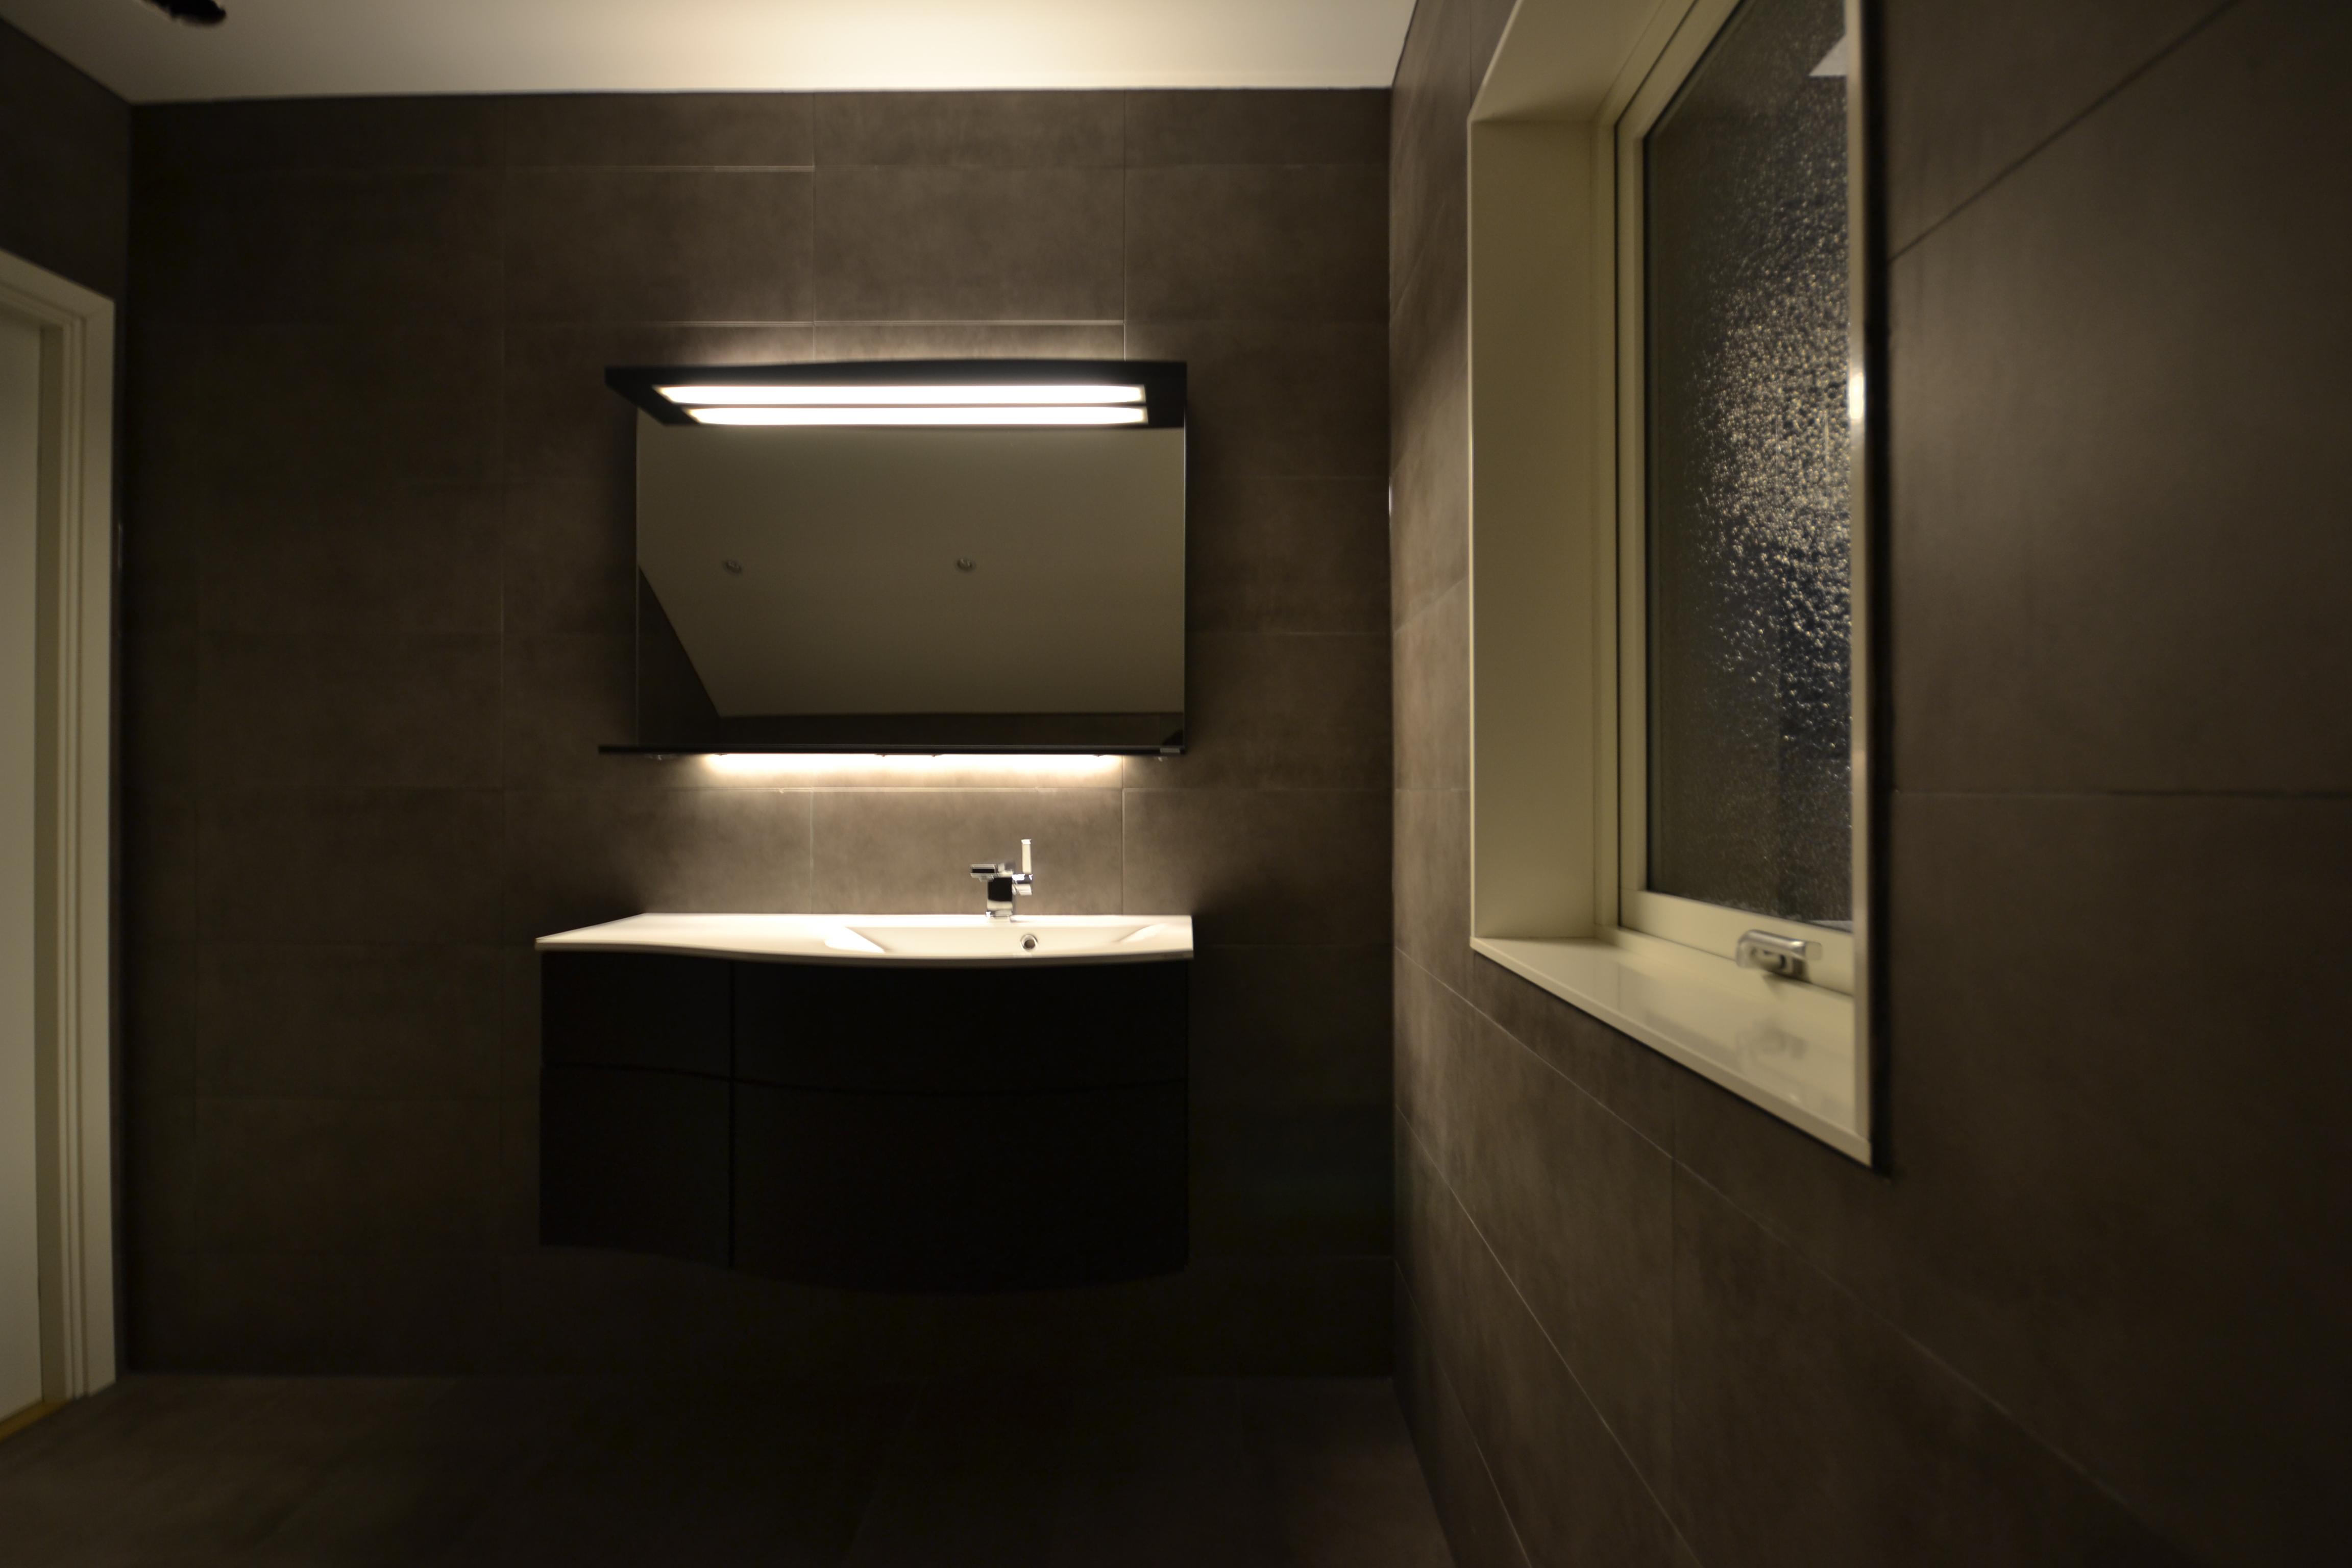 badrumsrenovering göteborg